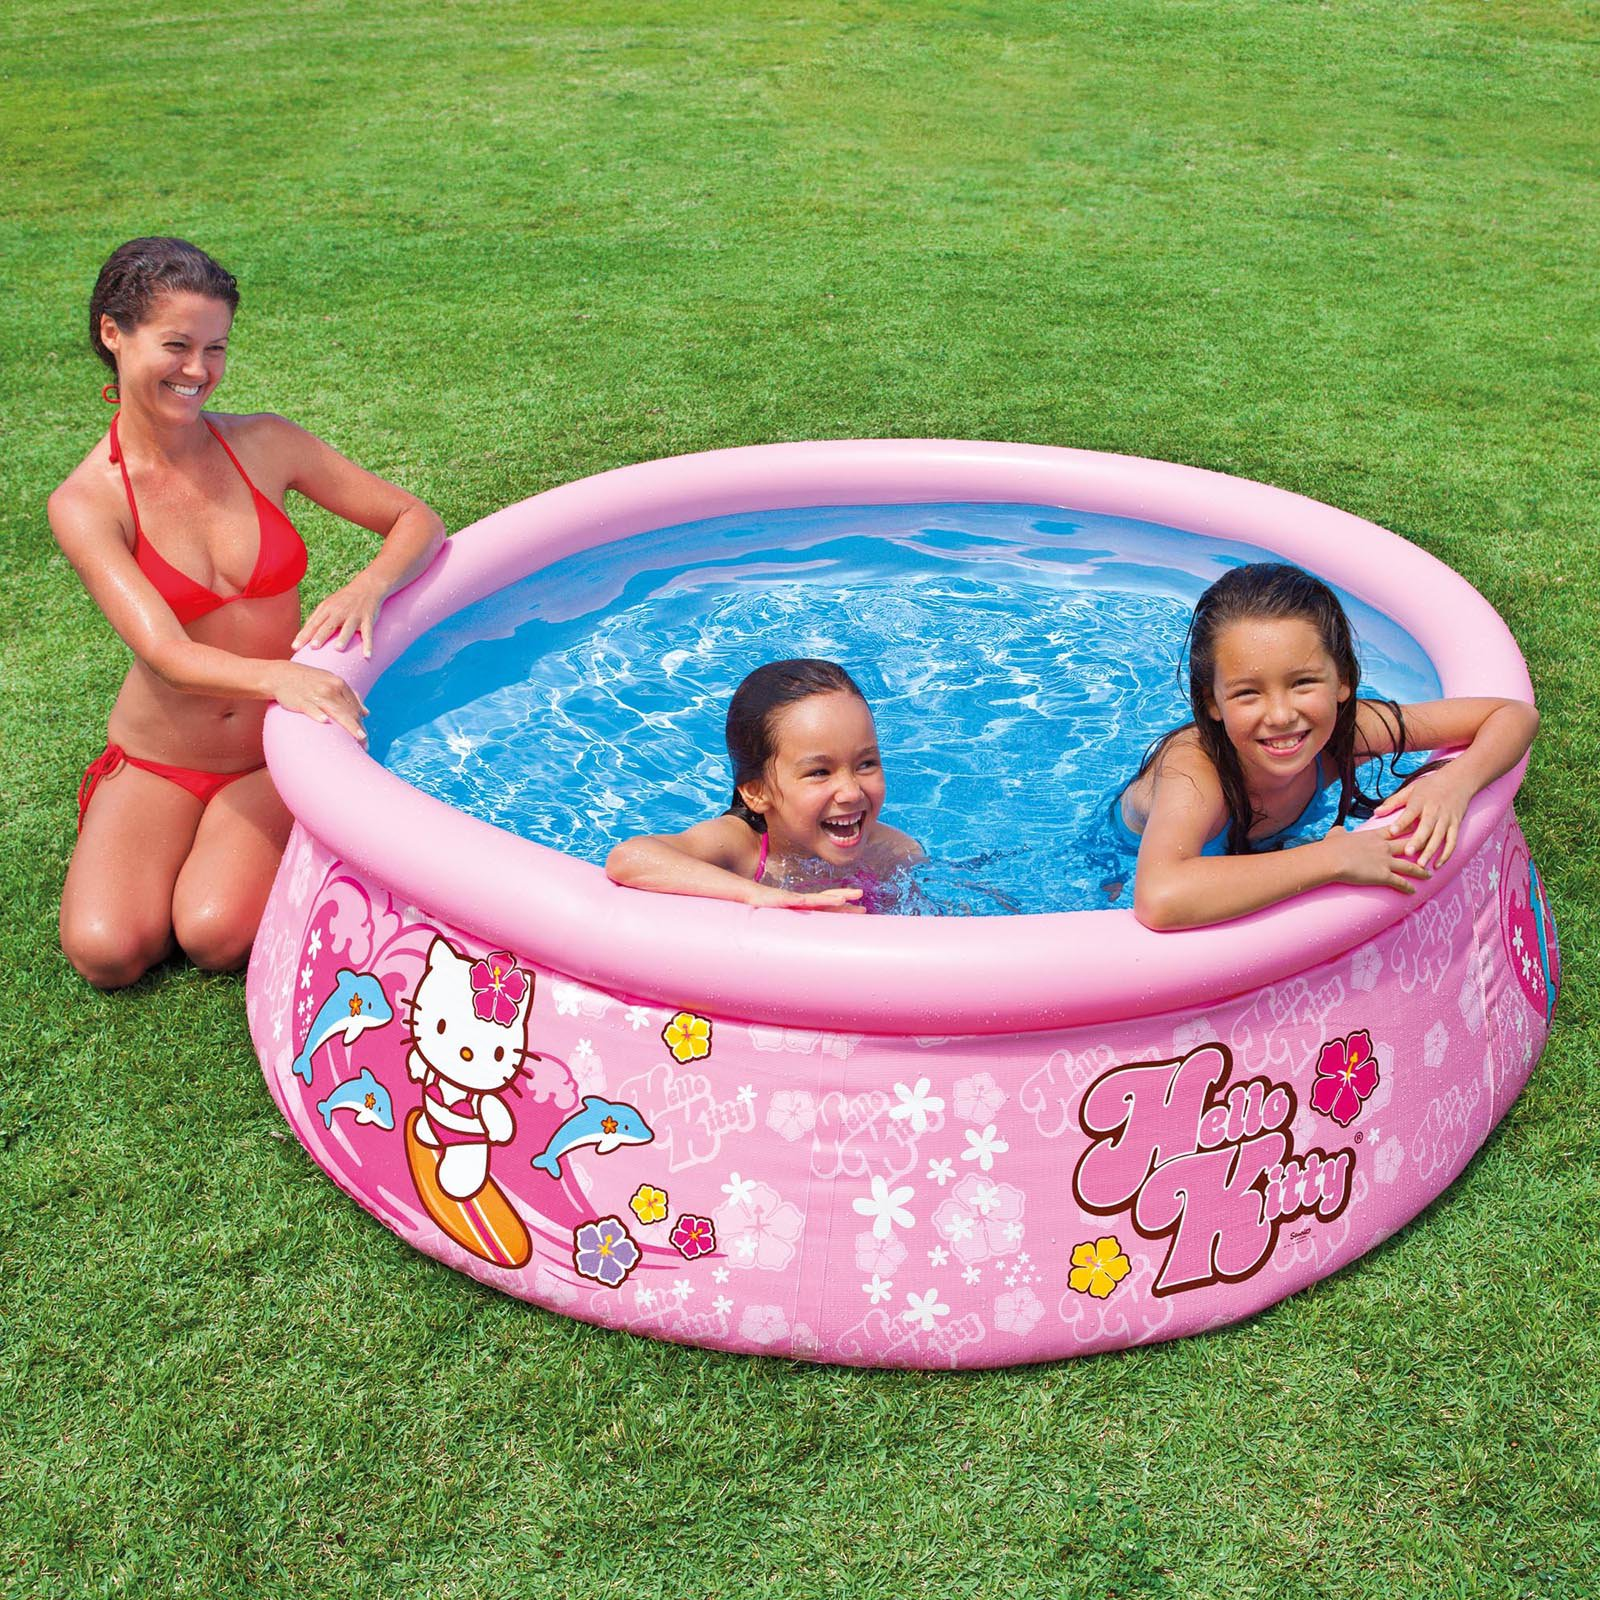 Intex Hello Kitty Easy Set Inflatable Instant Kids Swimming Pool | 28104EP    Walmart.com